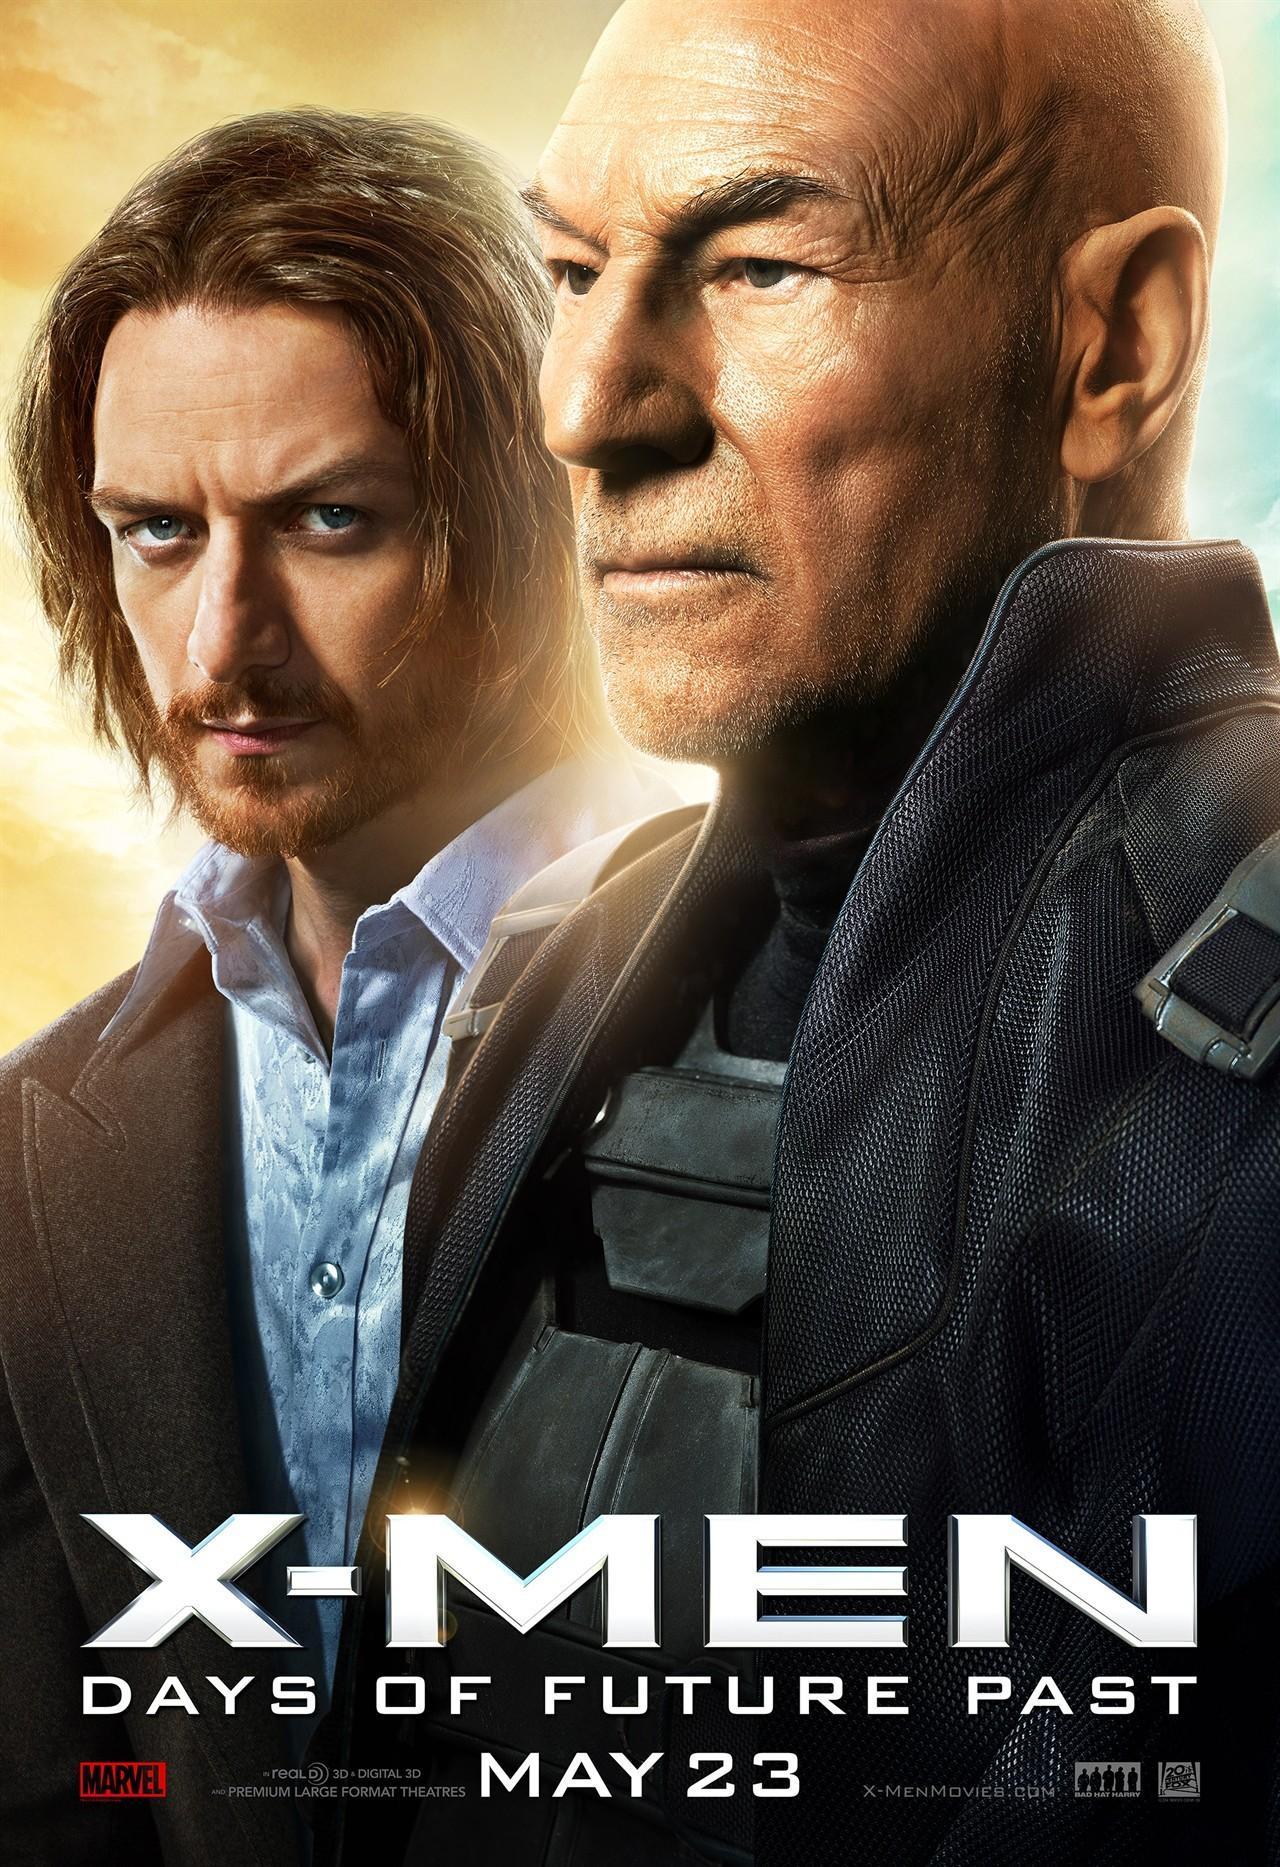 《X战警:逆转未来》再发新海报 两代X教授、野兽、暴风女亮相